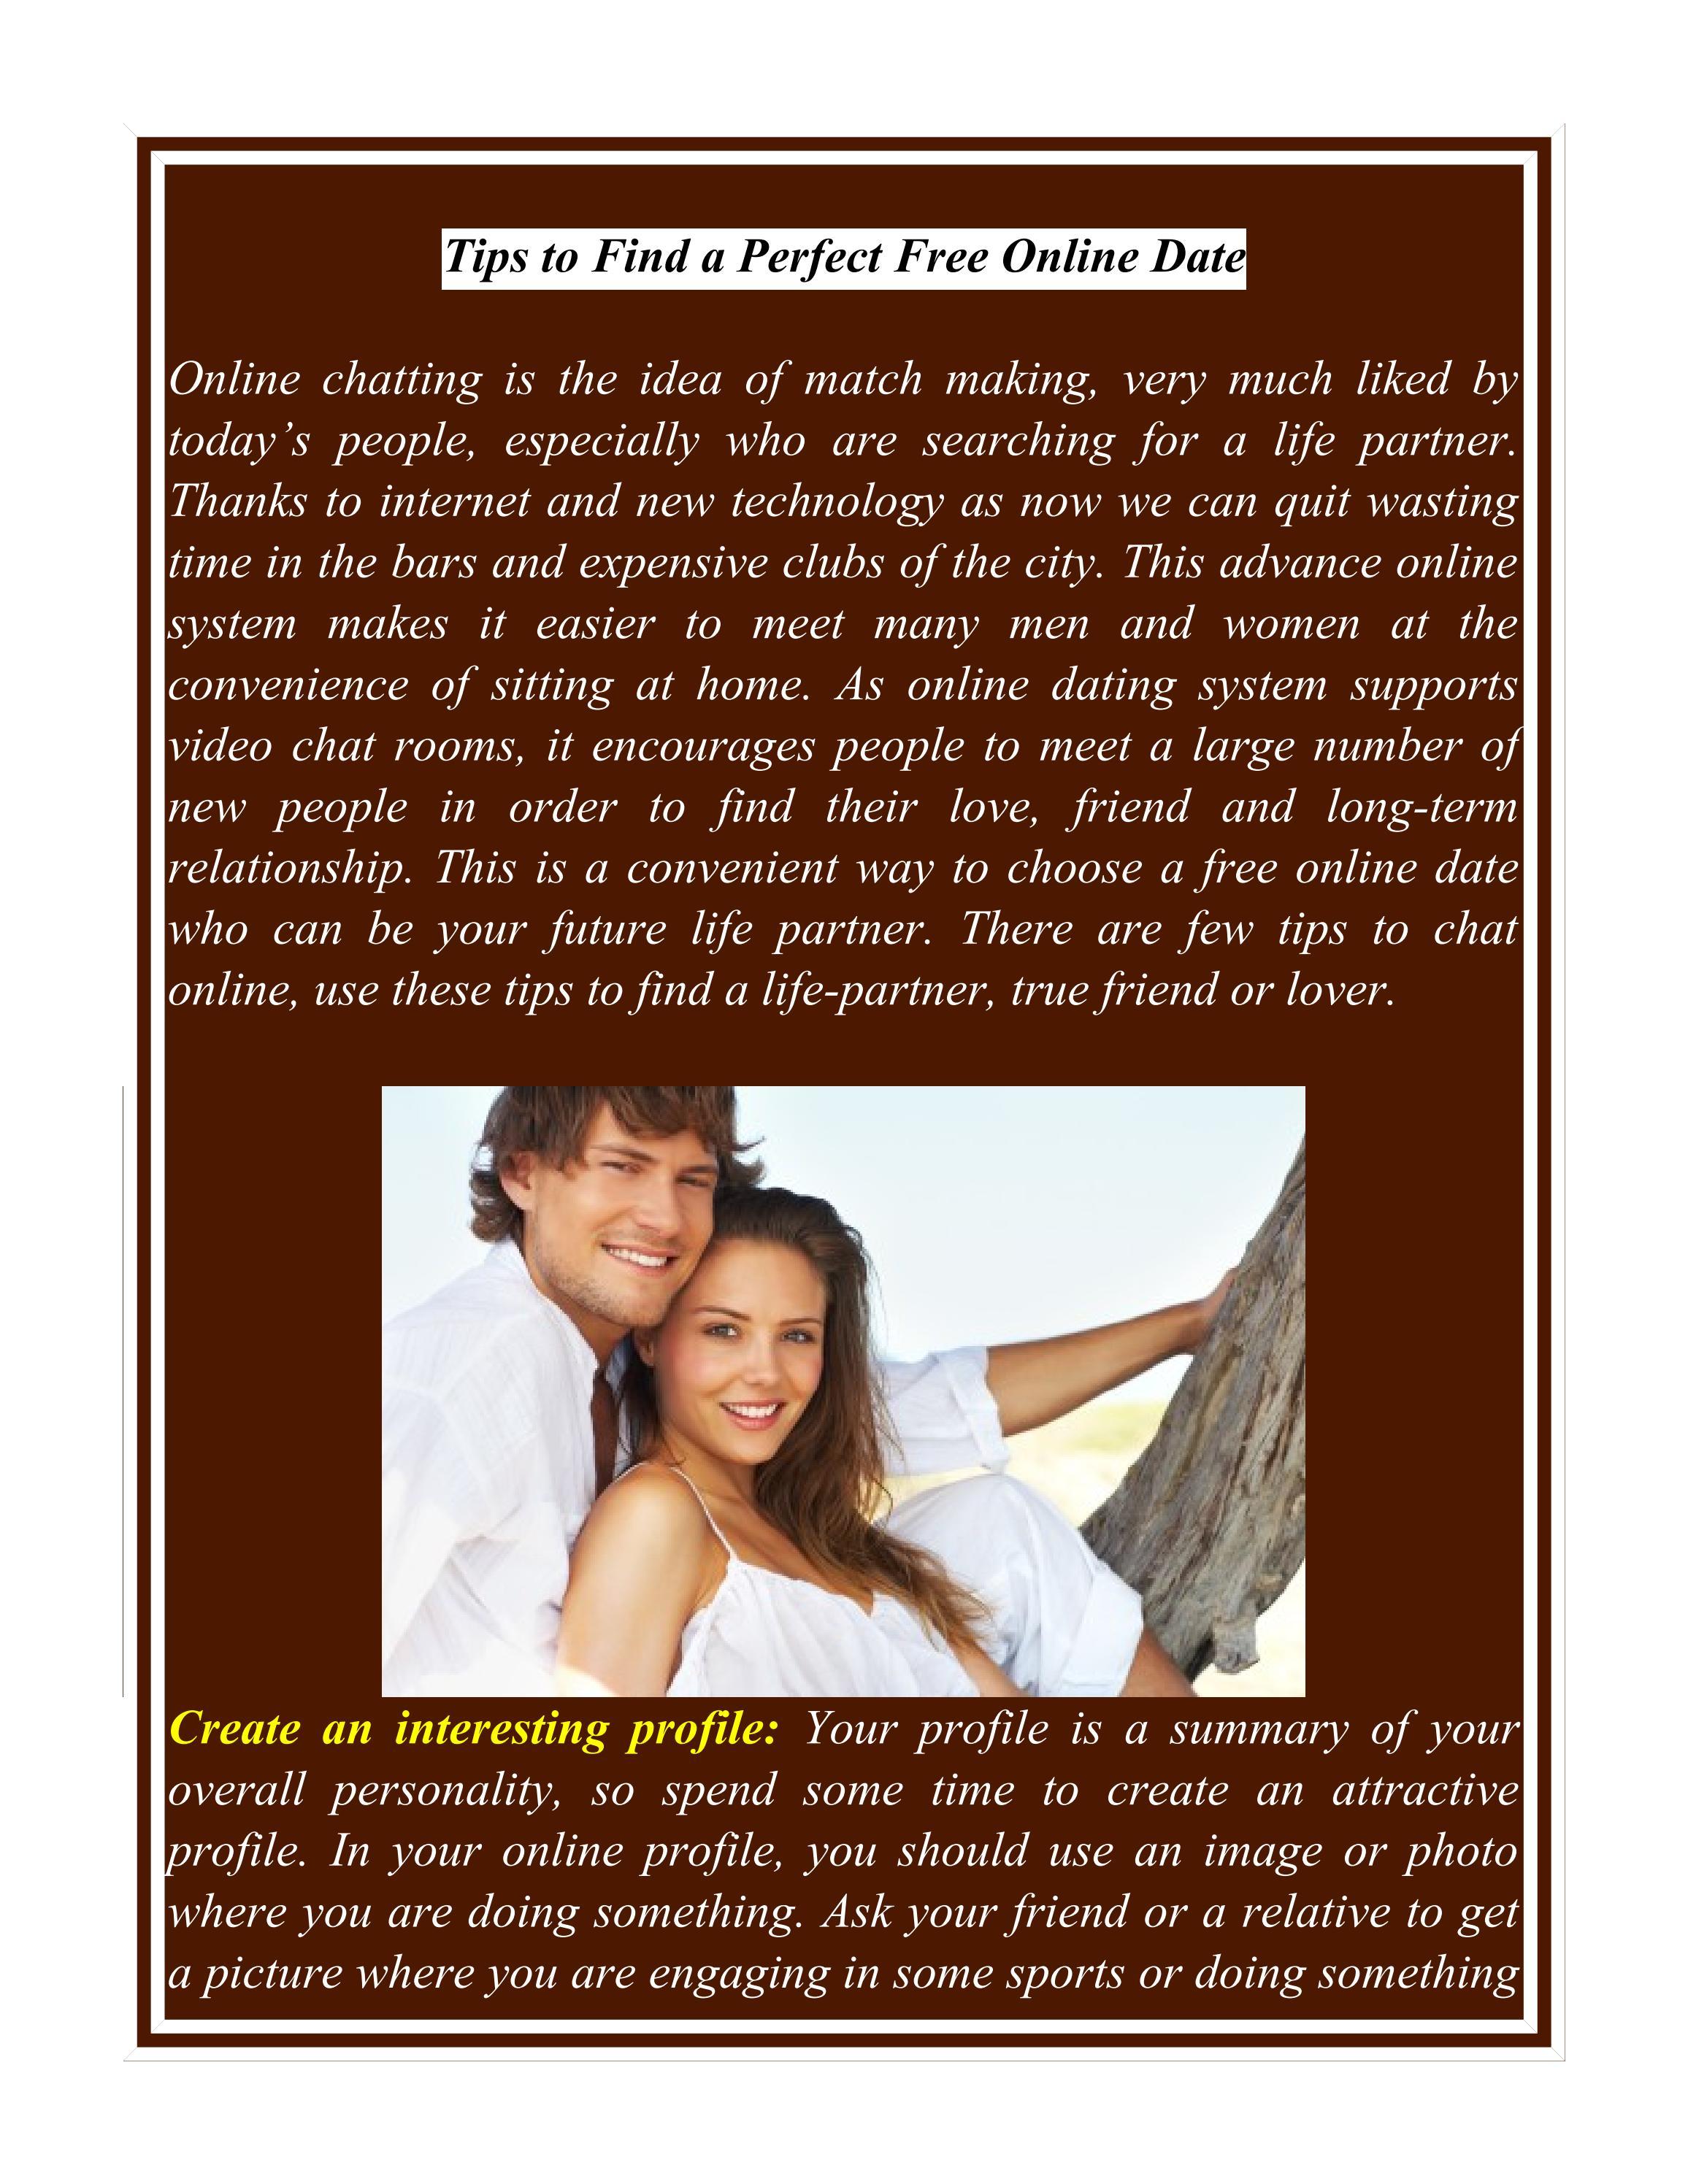 exempel på en perfekt online dating profil